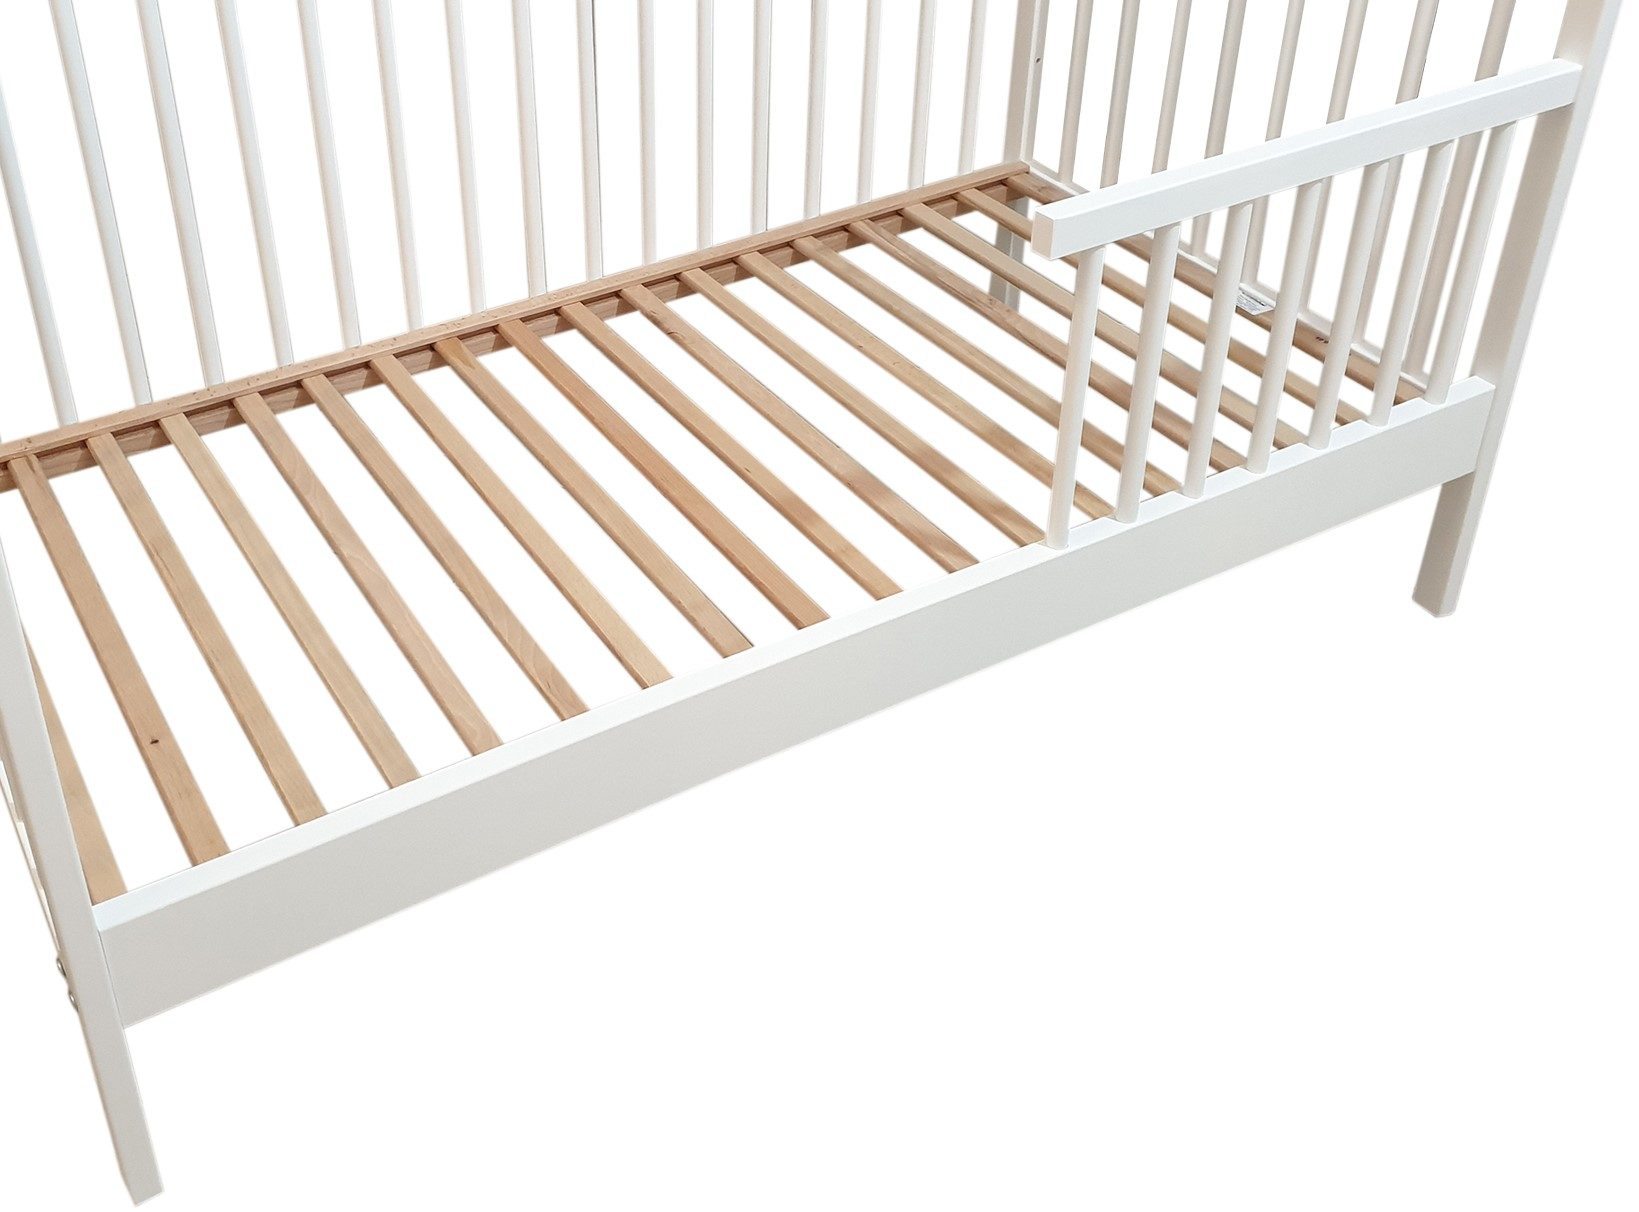 Barierka do łóżka